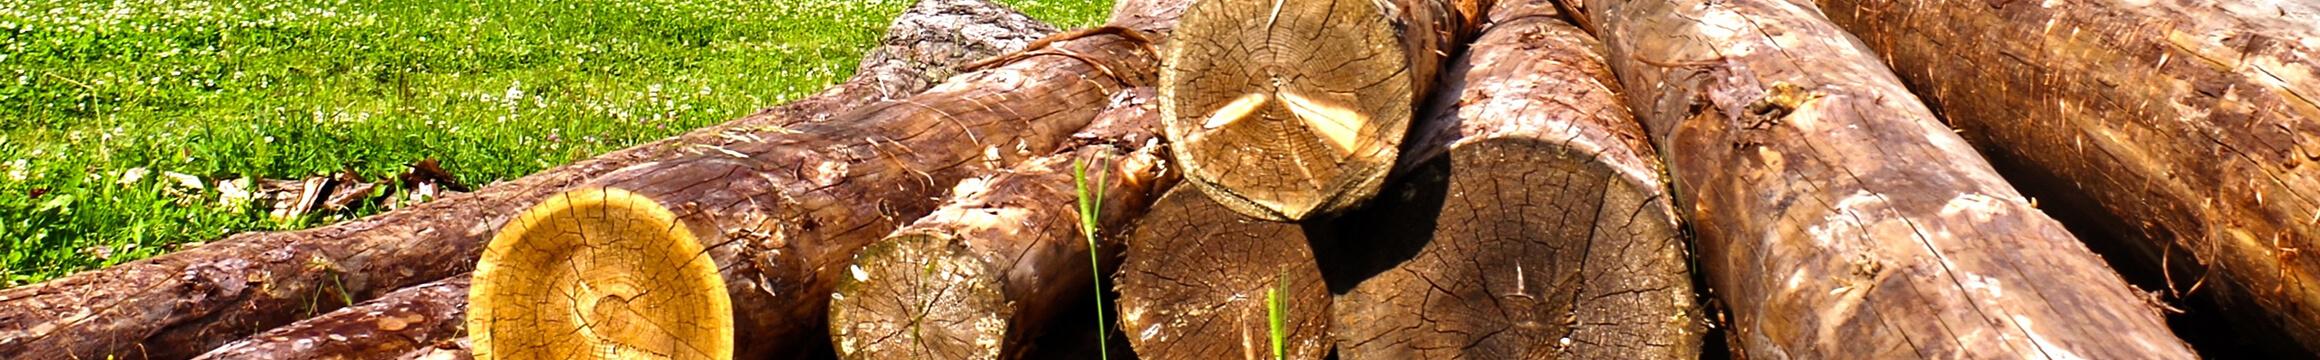 Wood Rustic 02